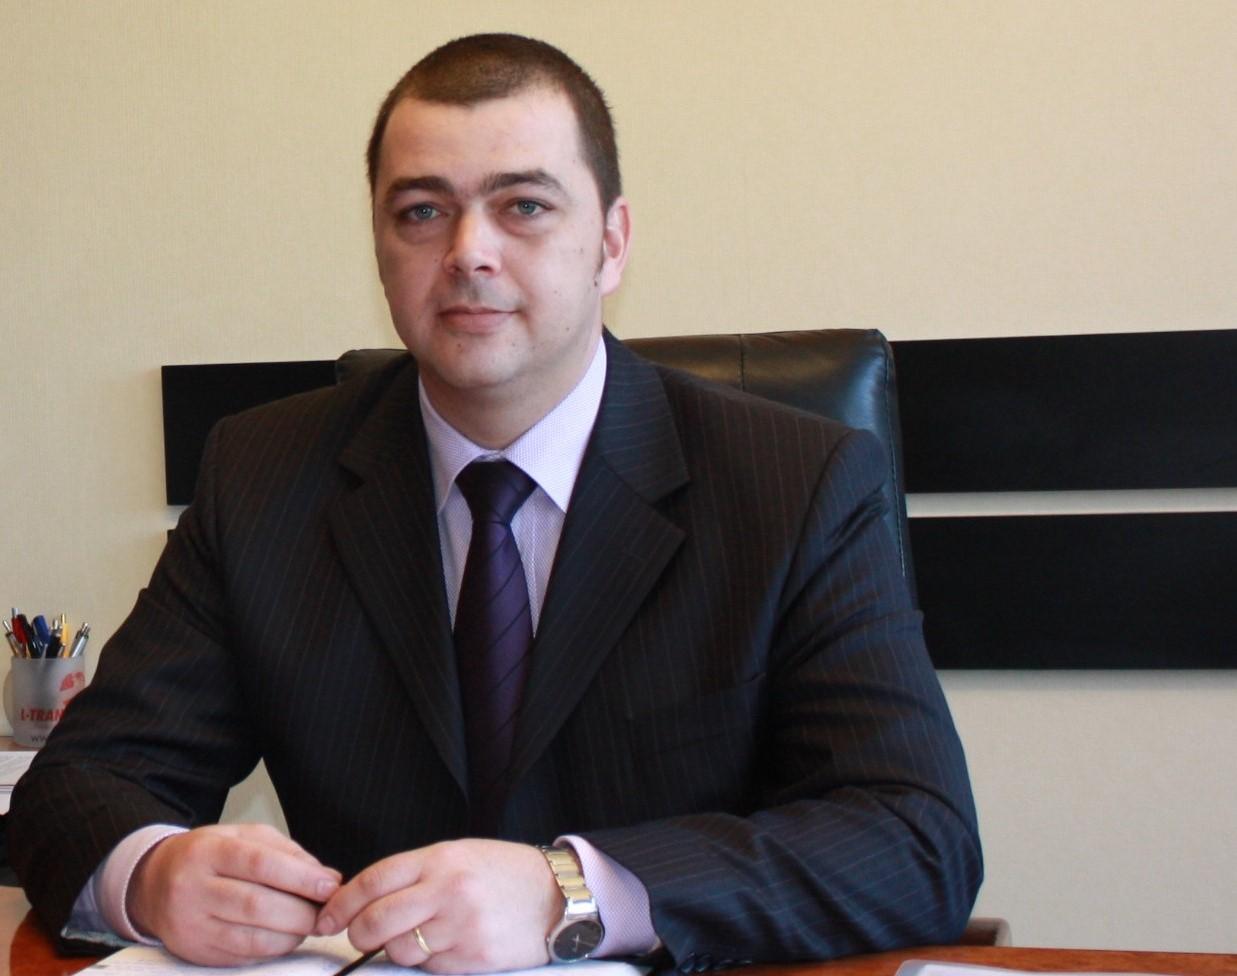 Șeful IPJ Sibiu, Tiberiu Ivancea, confirmat cu SARS CoV-2